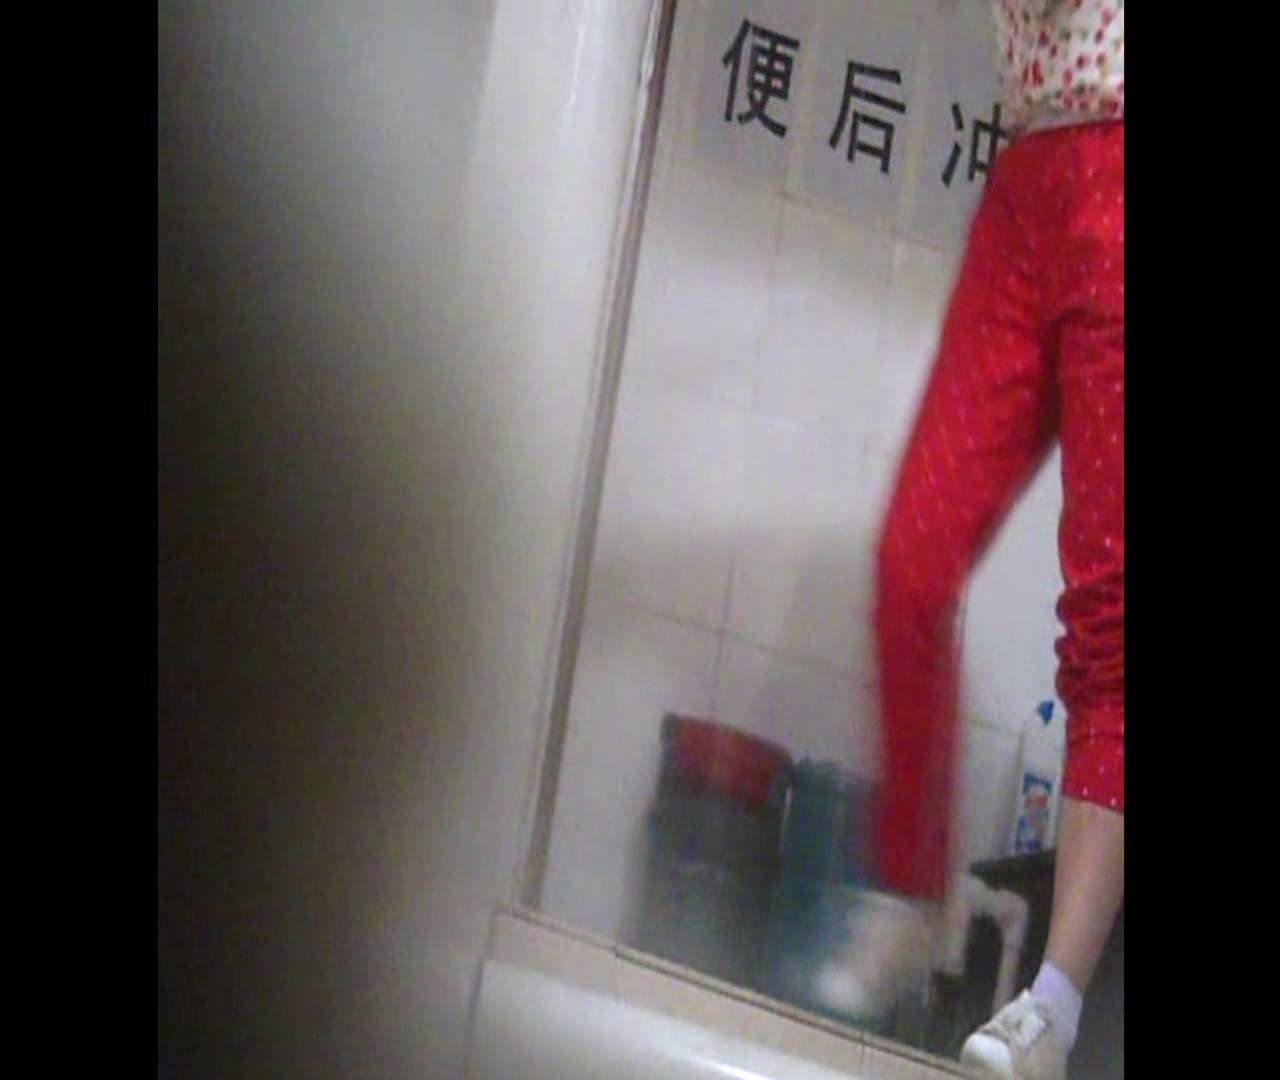 Vol.01 赤のパンツスタイルがとっても眩しい!! パンツ特集 AV無料動画キャプチャ 61画像 2